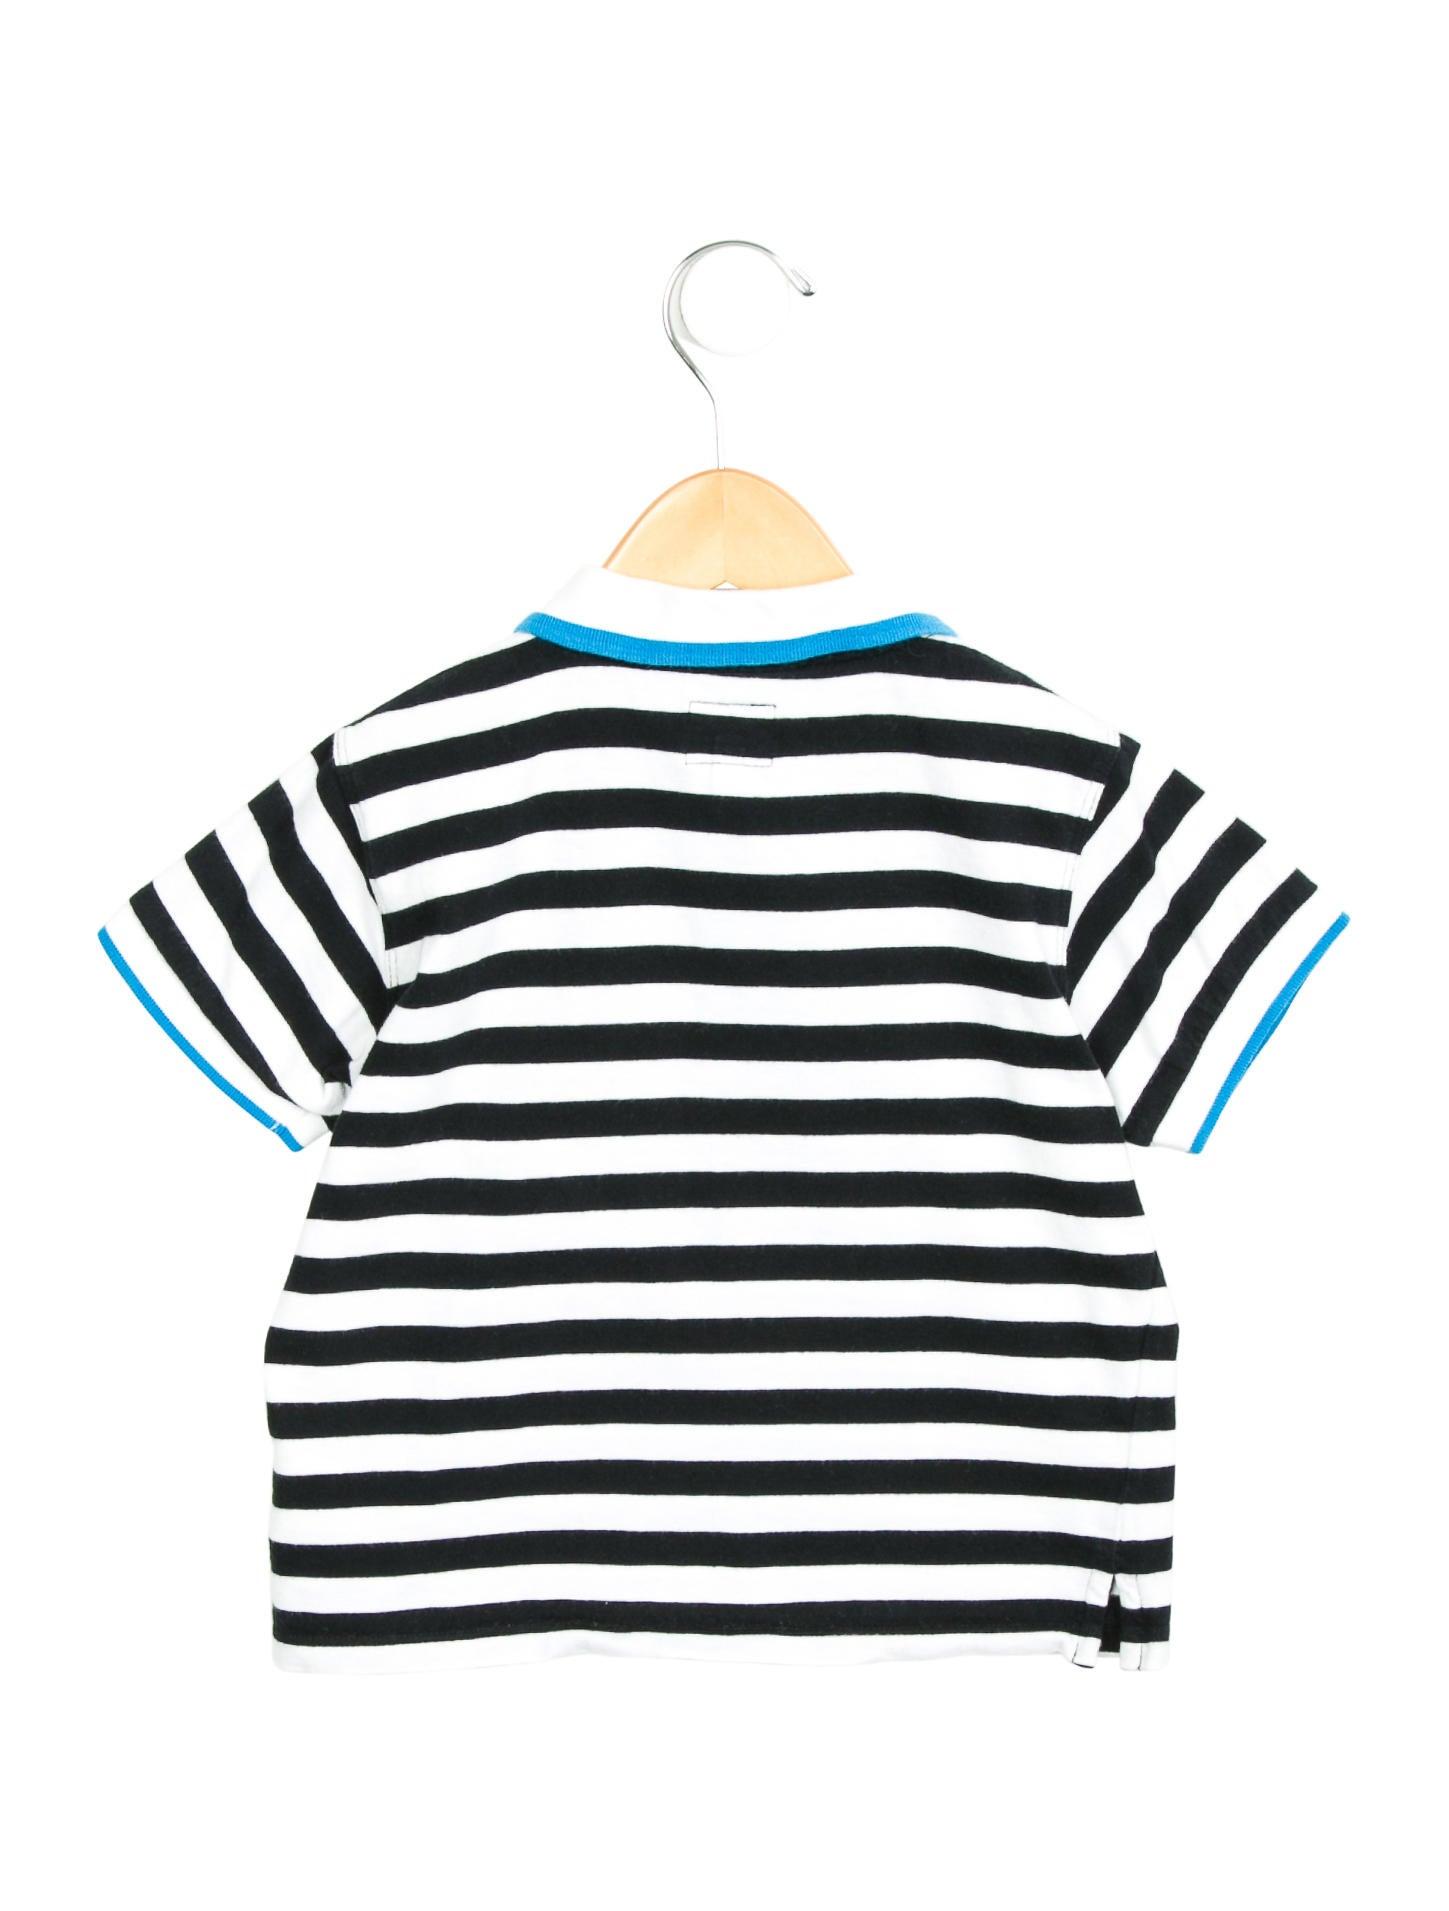 Armani junior boys 39 striped polo shirt boys wajun20373 for Boys striped polo shirts